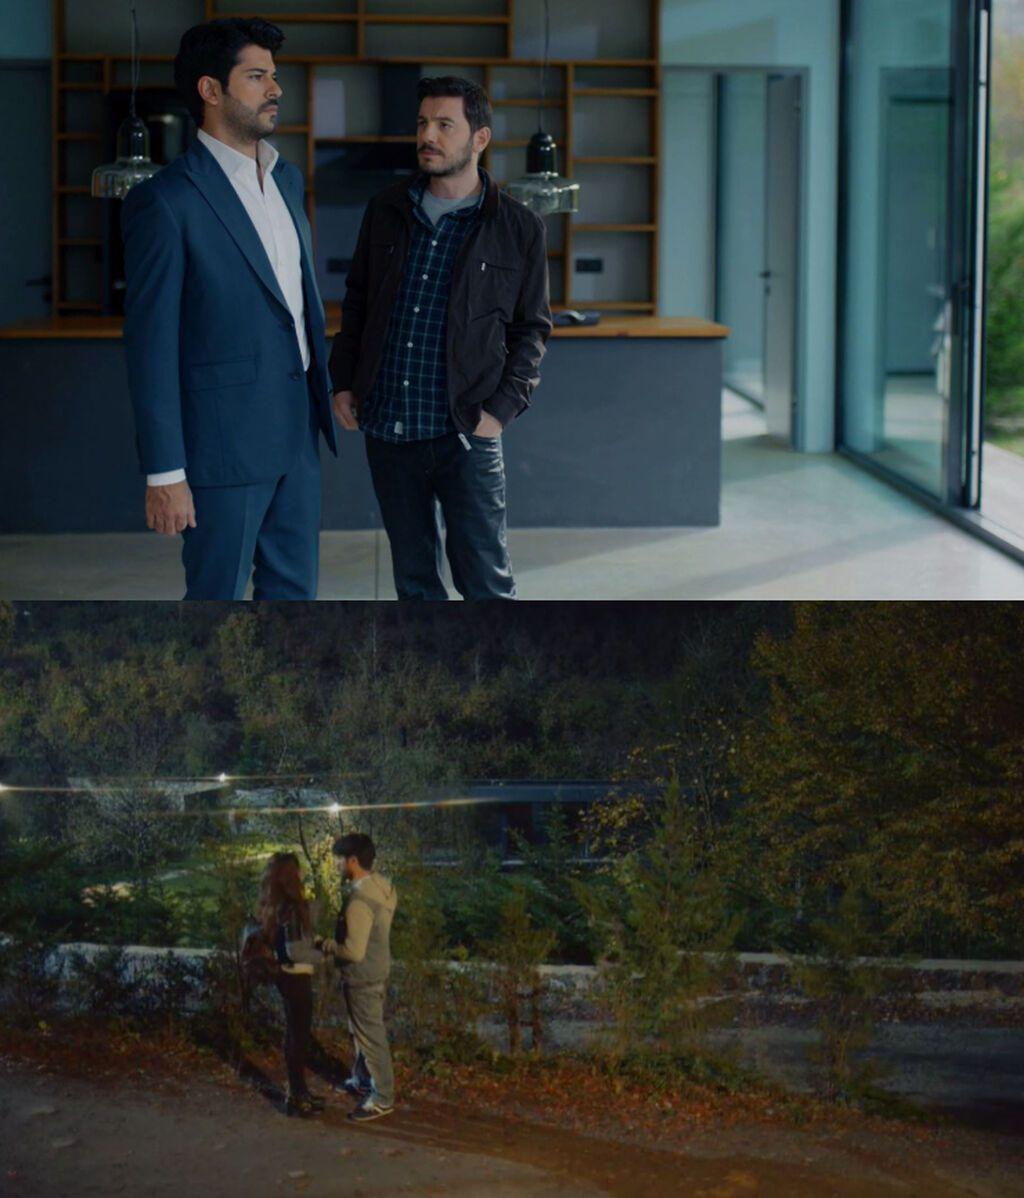 Casa de Kemal, de 'Kara sevda' y de Sanem en 'Erkenci Kus'